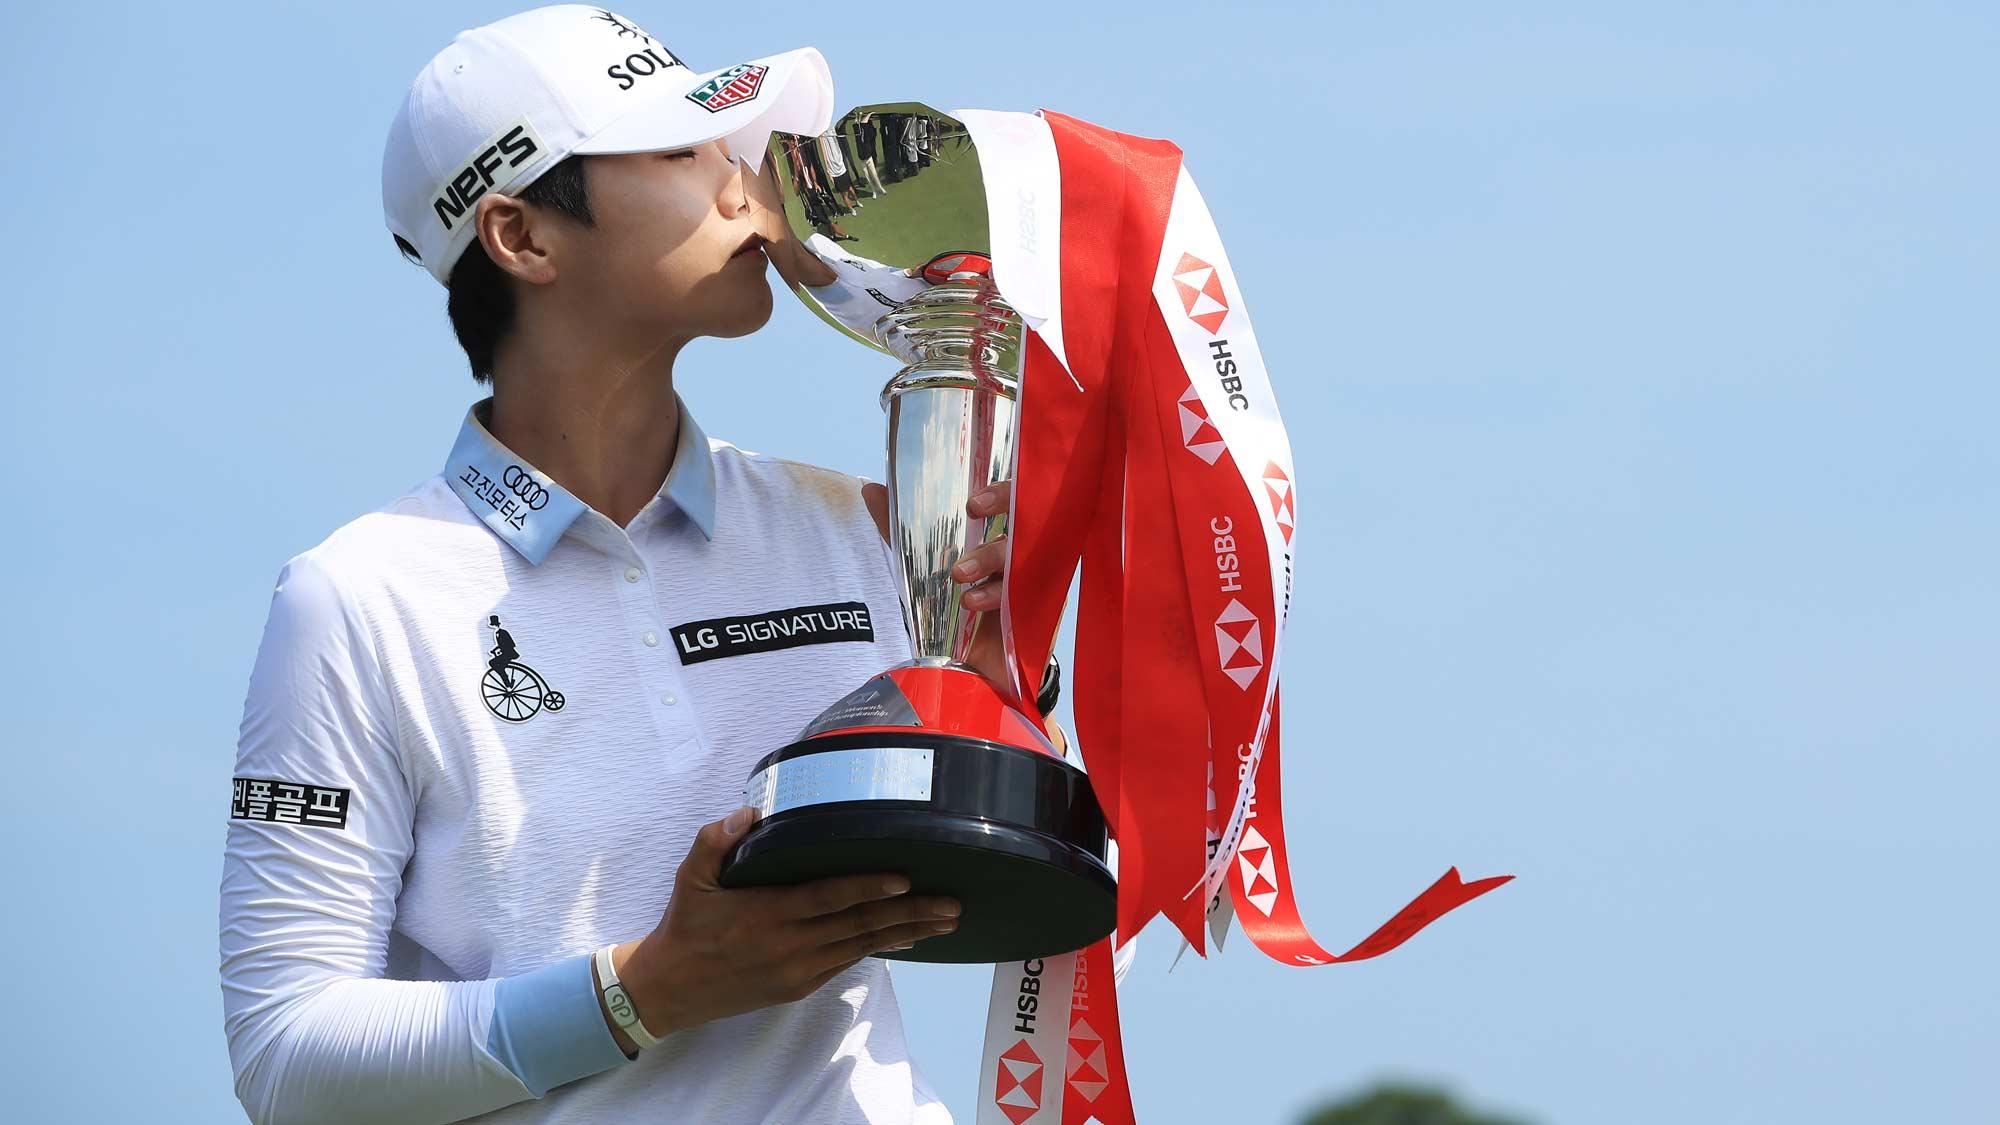 2019 Defending champion Sung Hyun Park